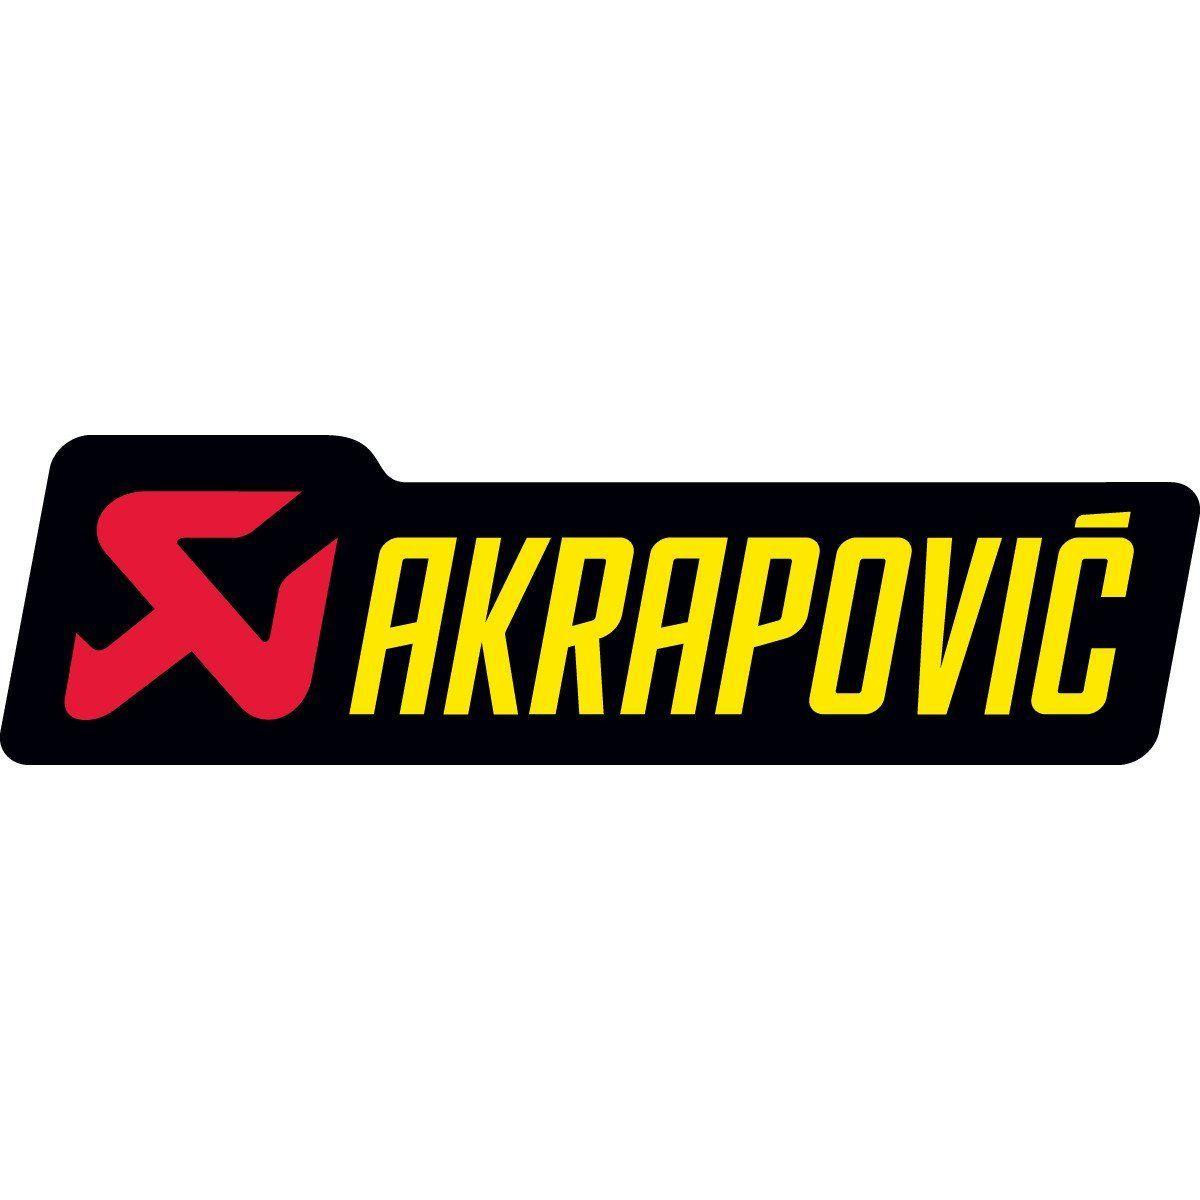 Tłumiki Akrapovic – klasa sama w sobie